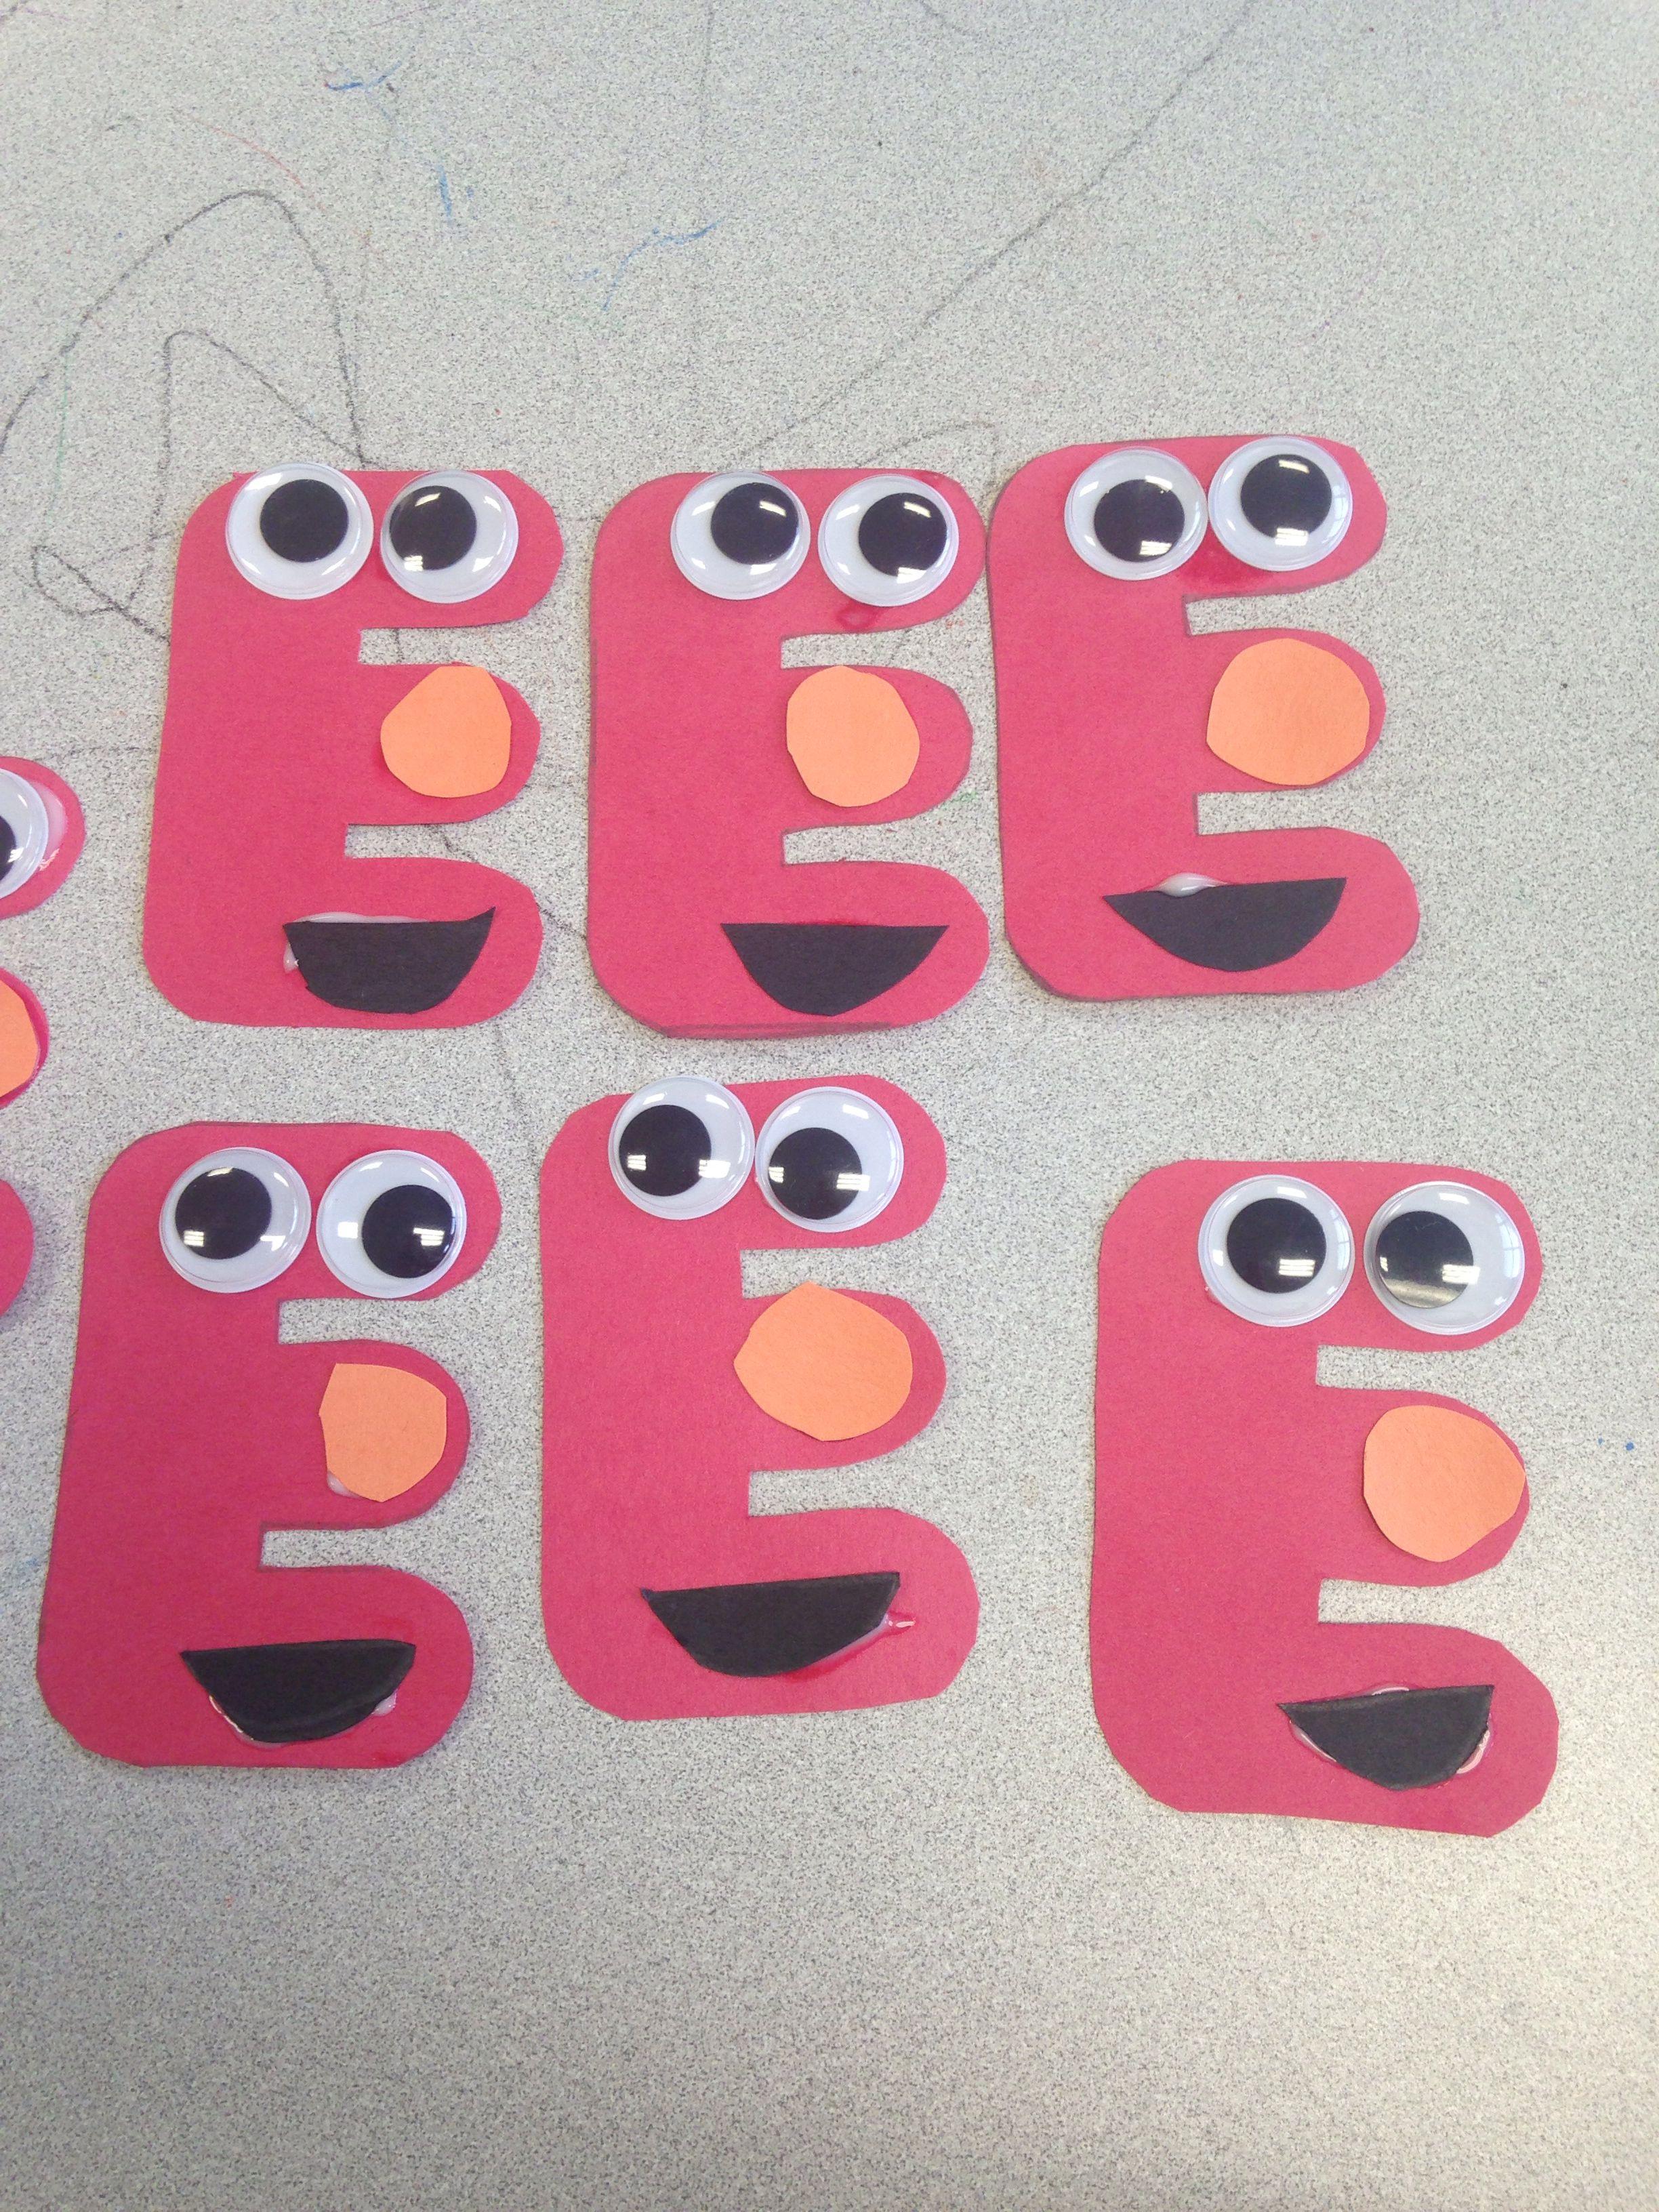 Broken Link But So Cute E Is For Elmo Easy Preschool Craft Activity